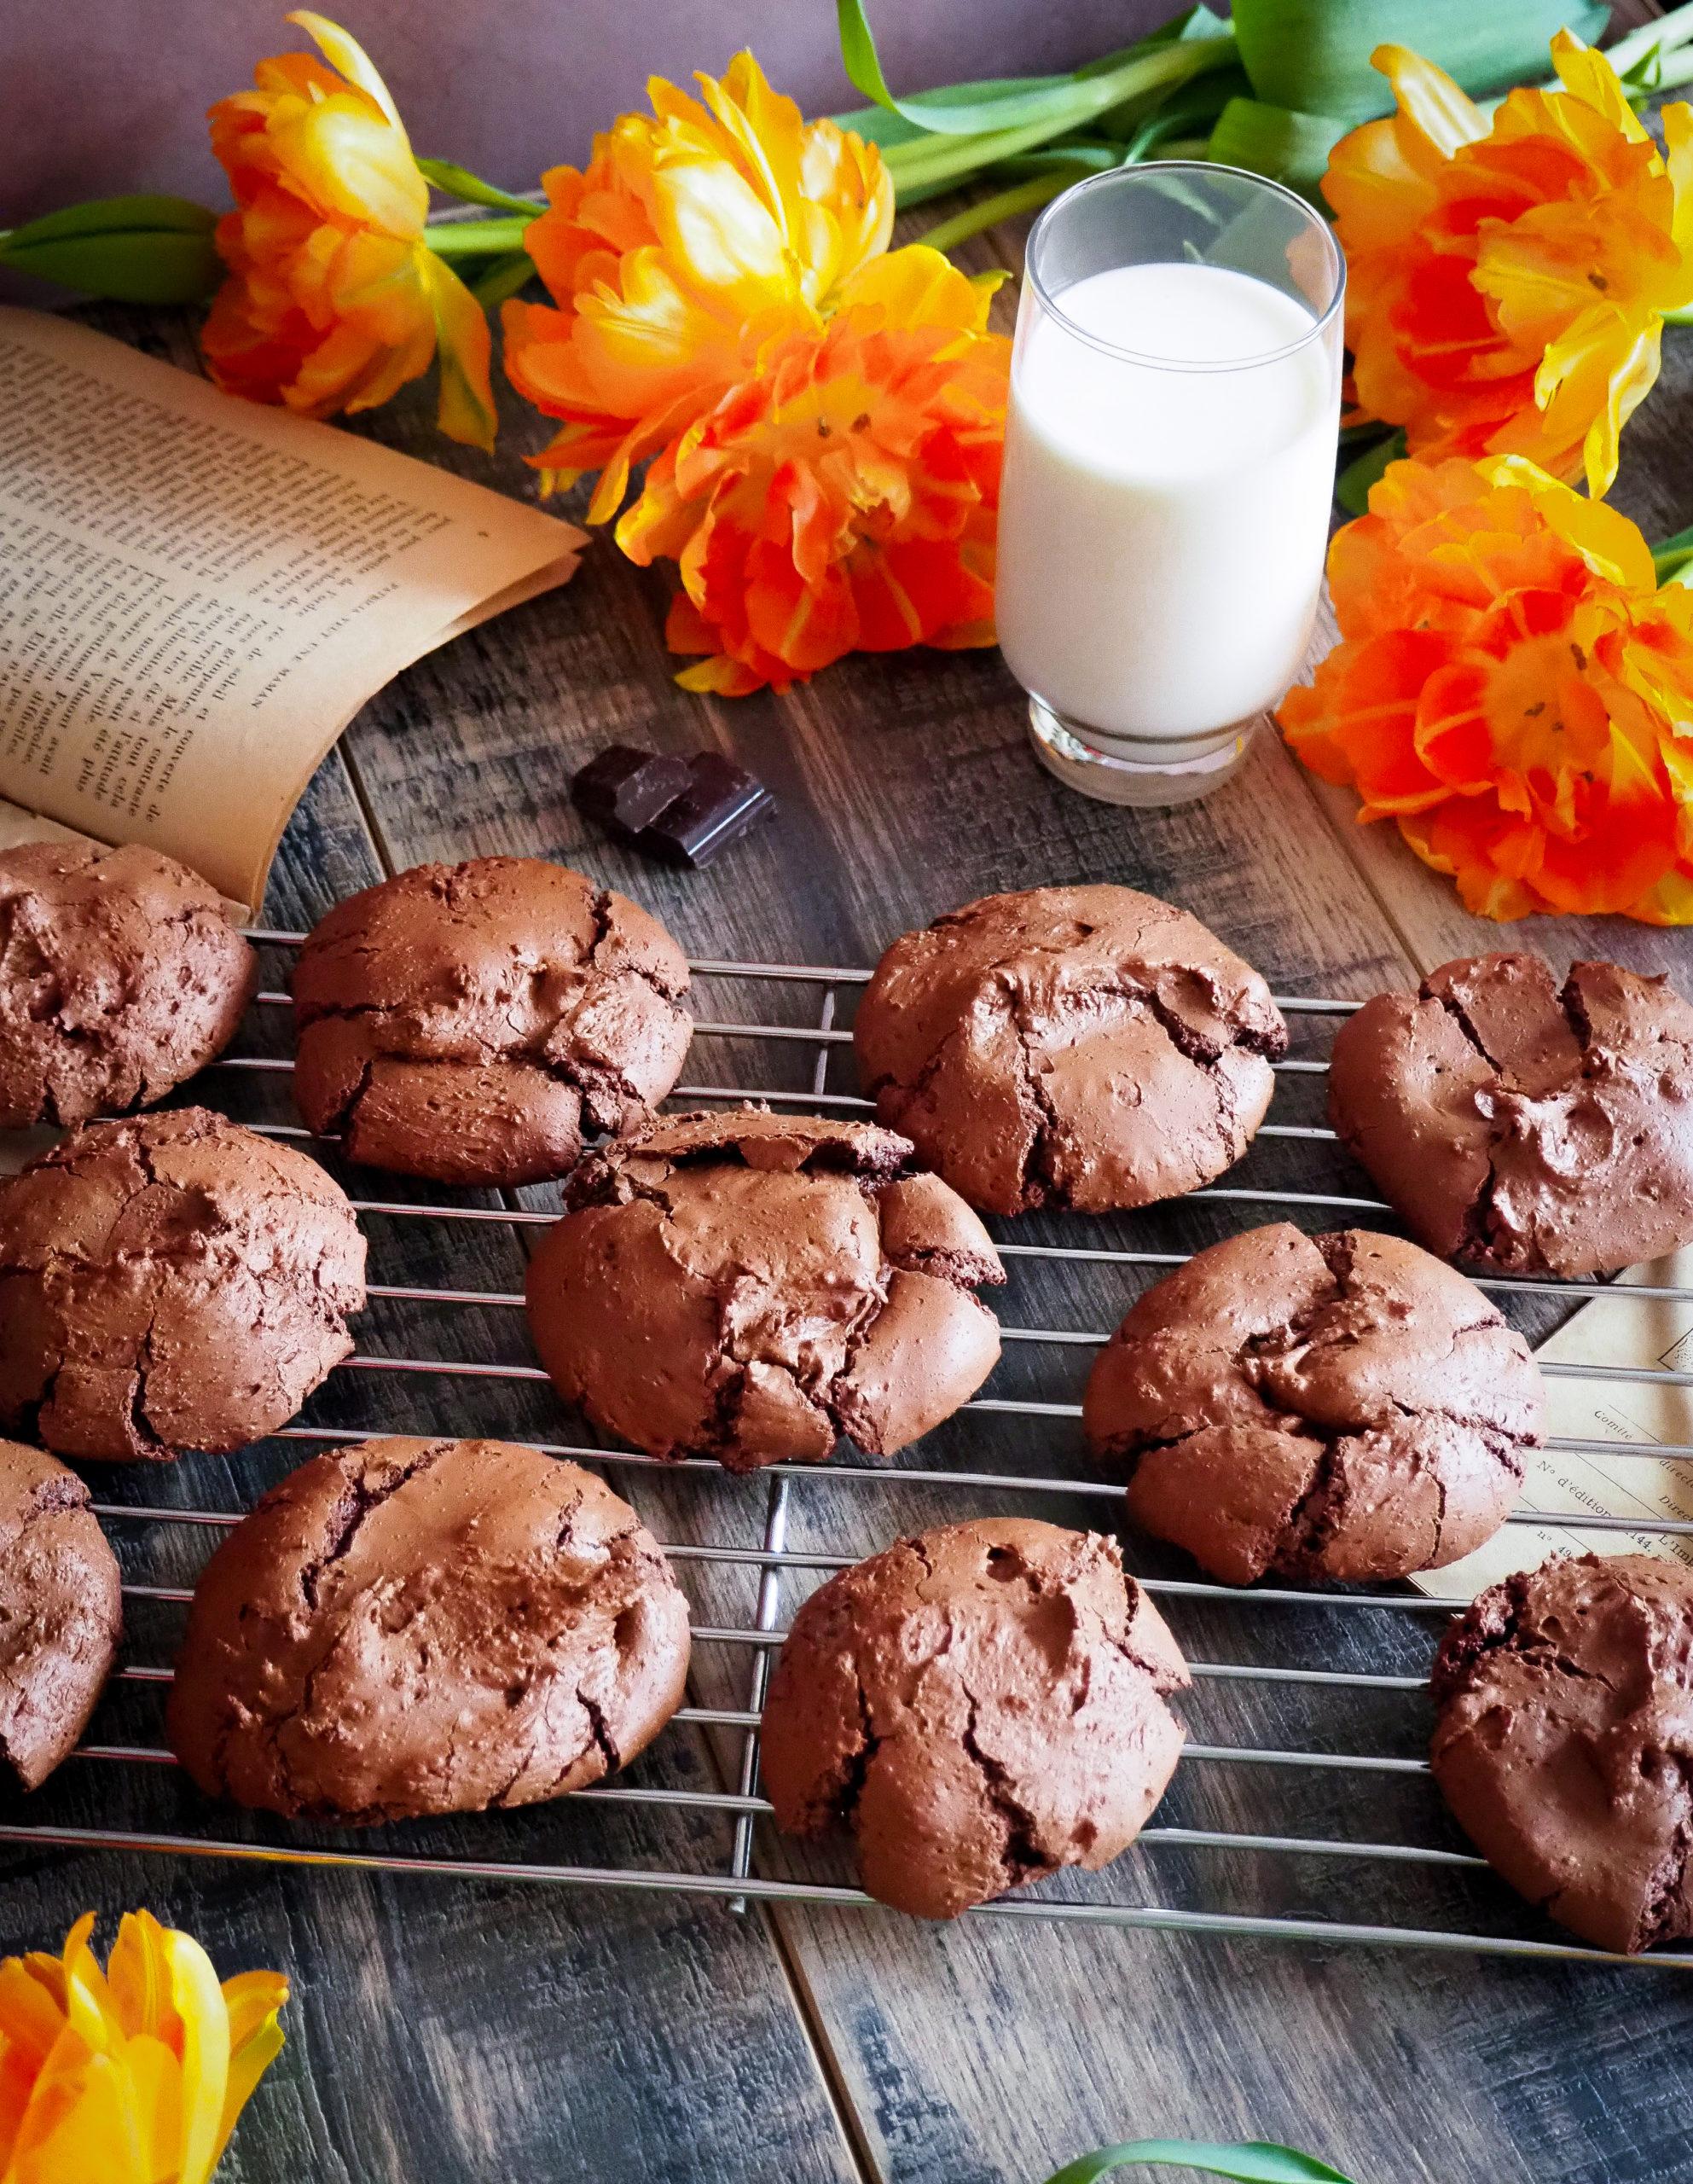 food-photography-serie-warm-cookies-chocolat-1